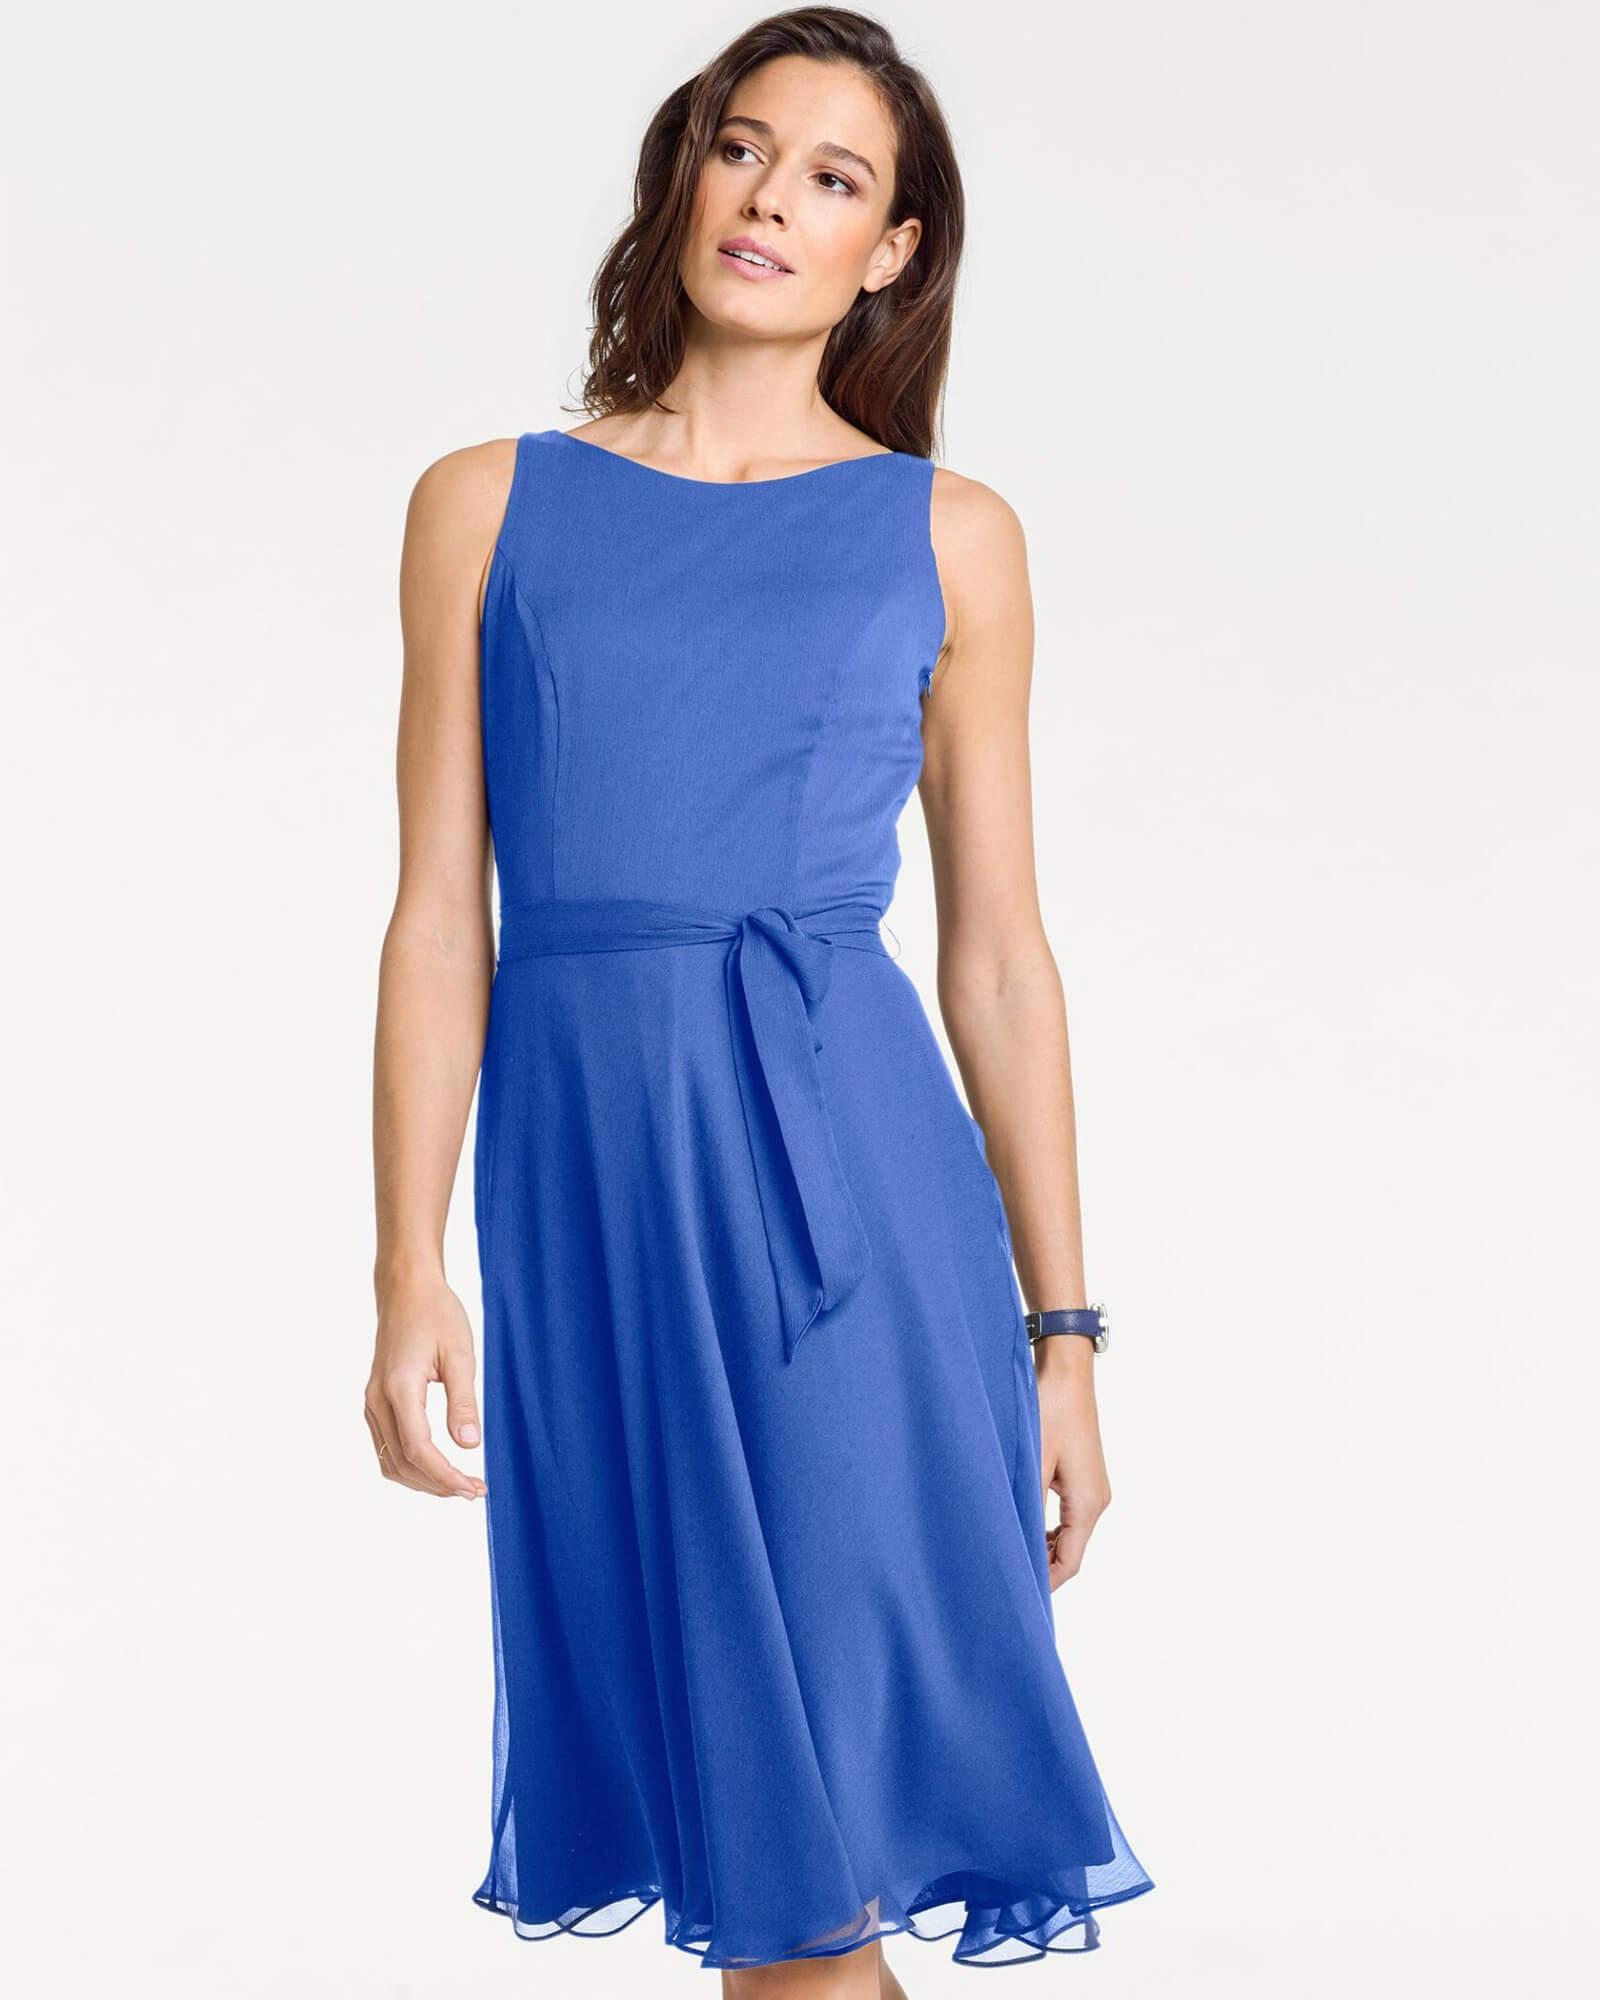 Prinzesskleid in Blau